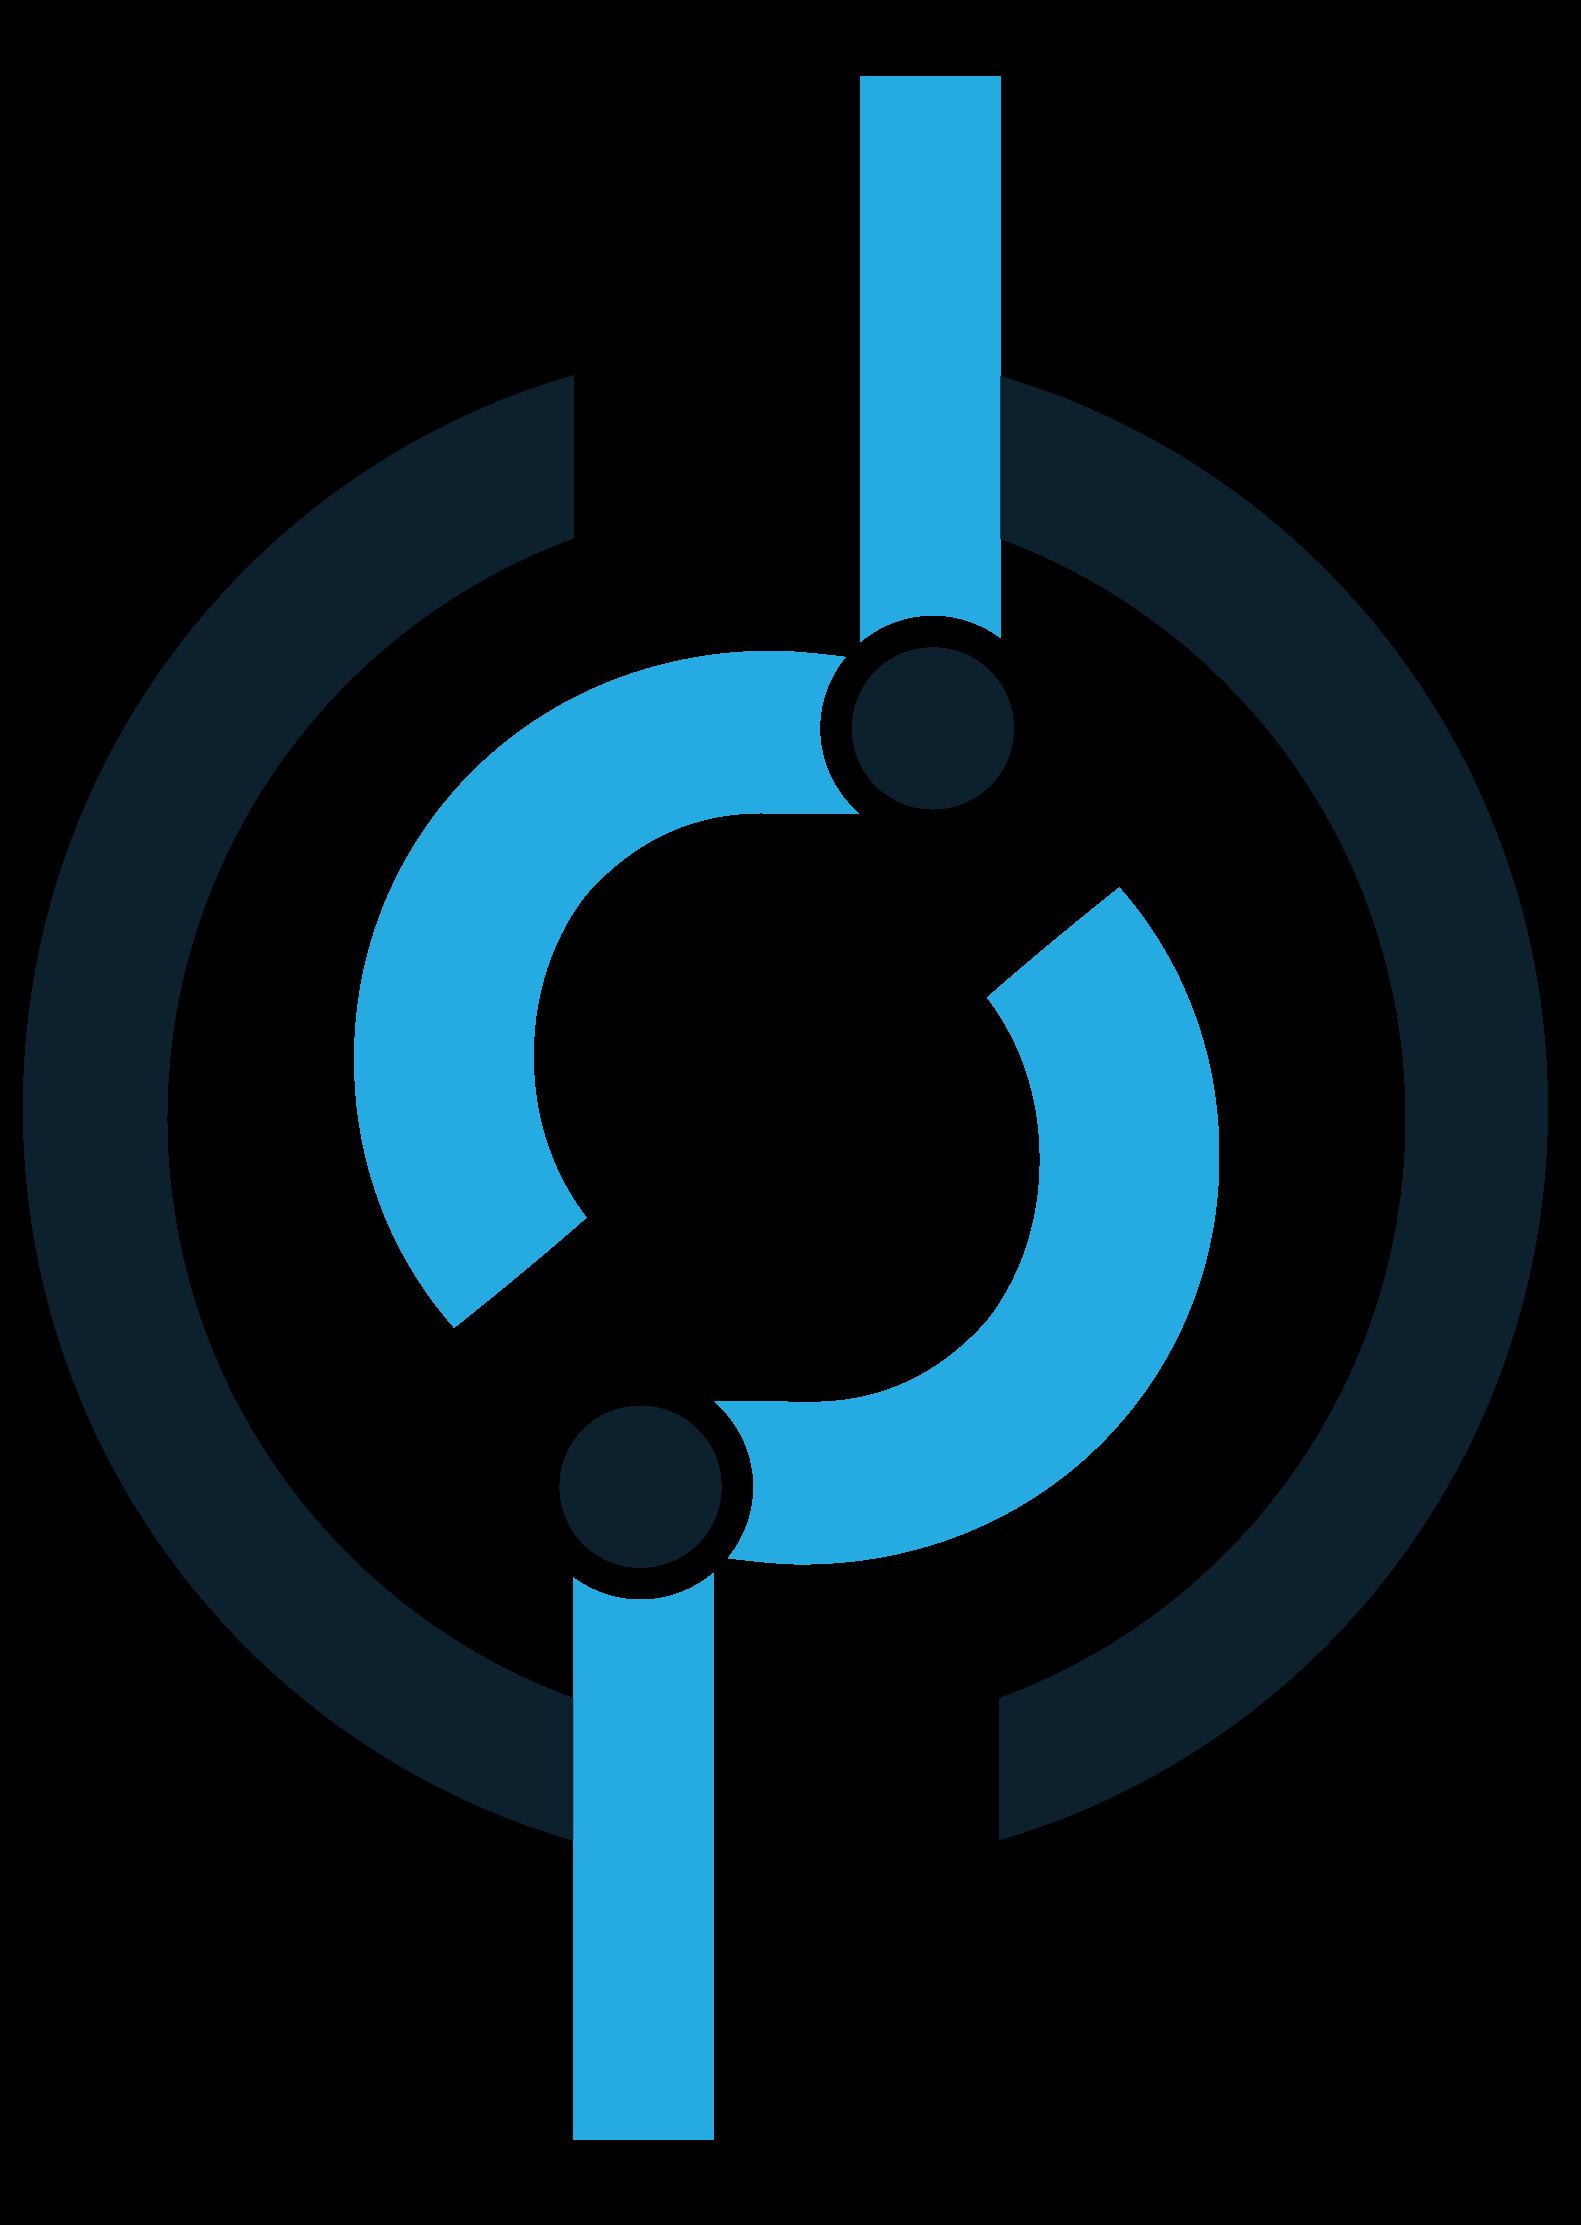 Pocket Network blockchain jobs